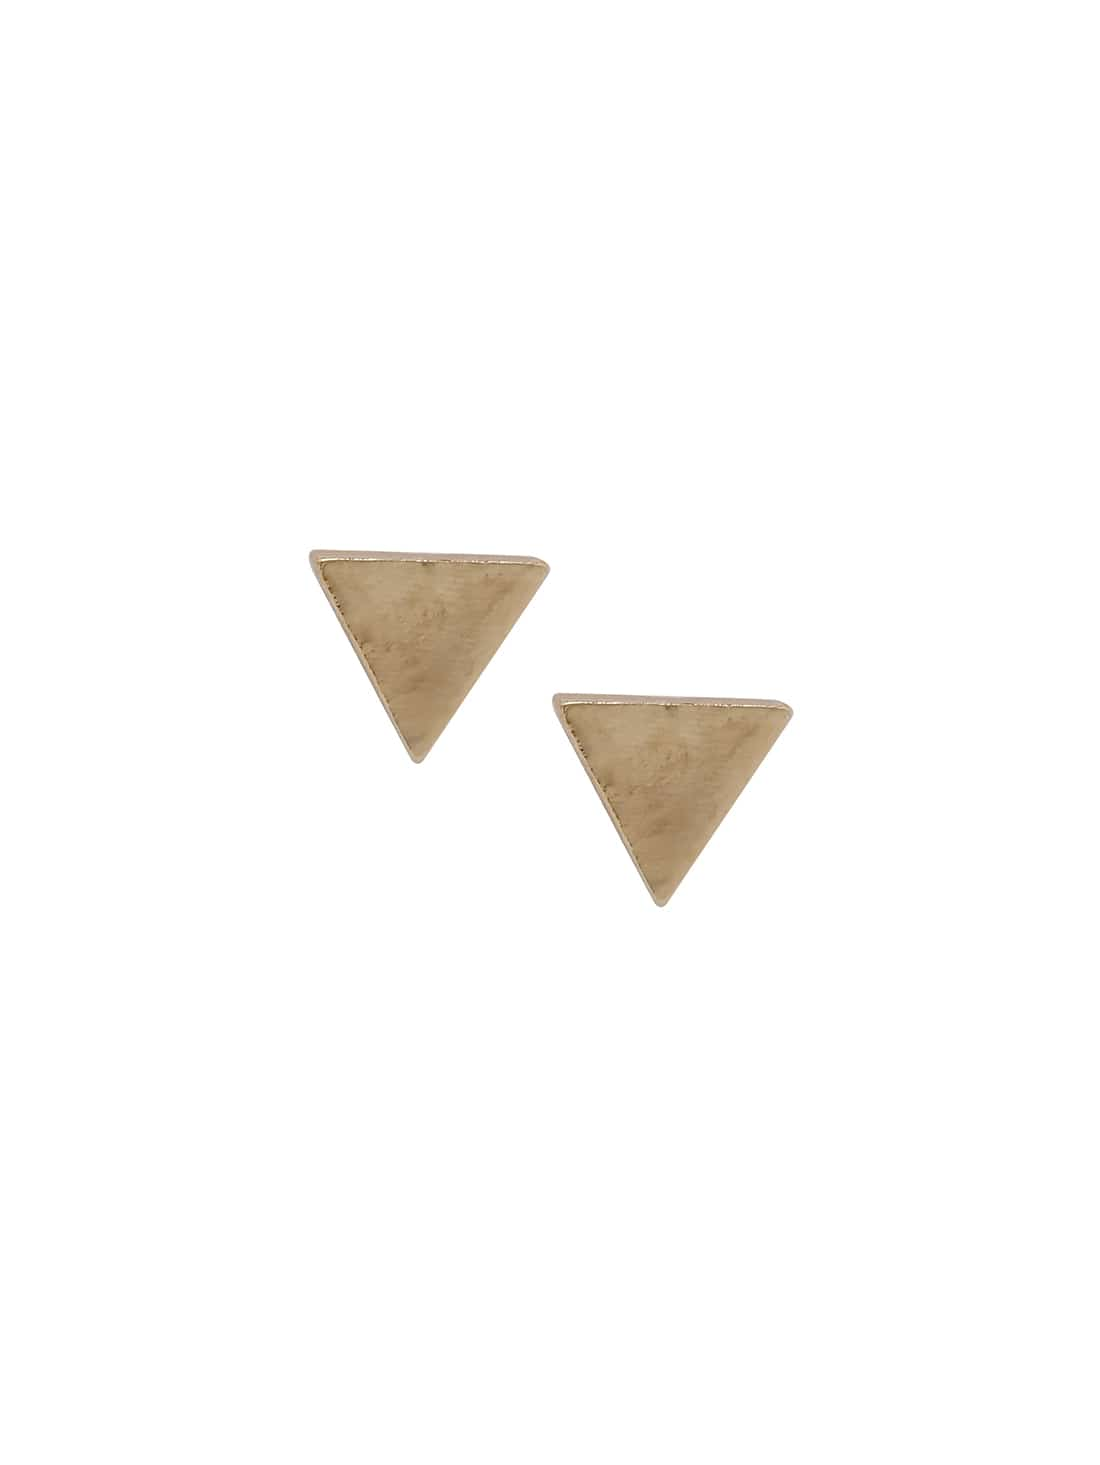 Golden Minimalist Triangle Ear Studs